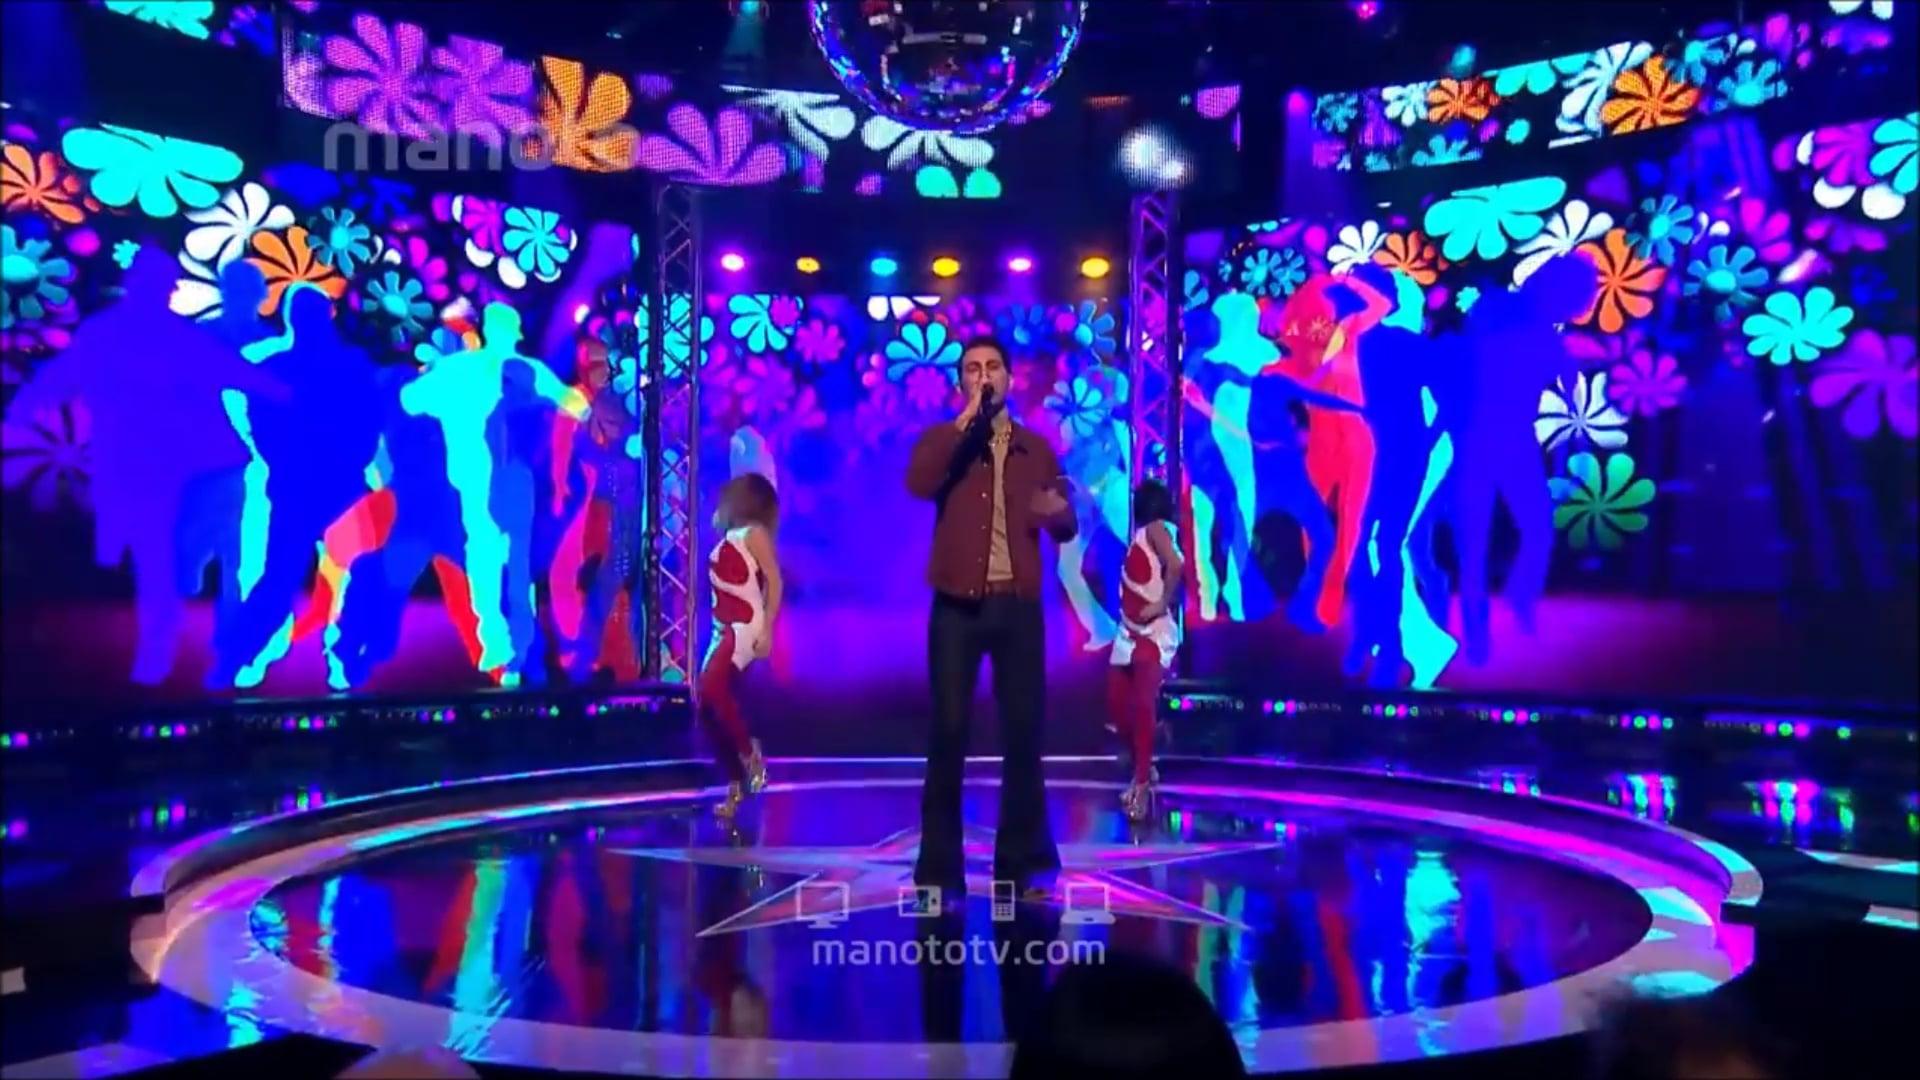 The Stage Manoto TV